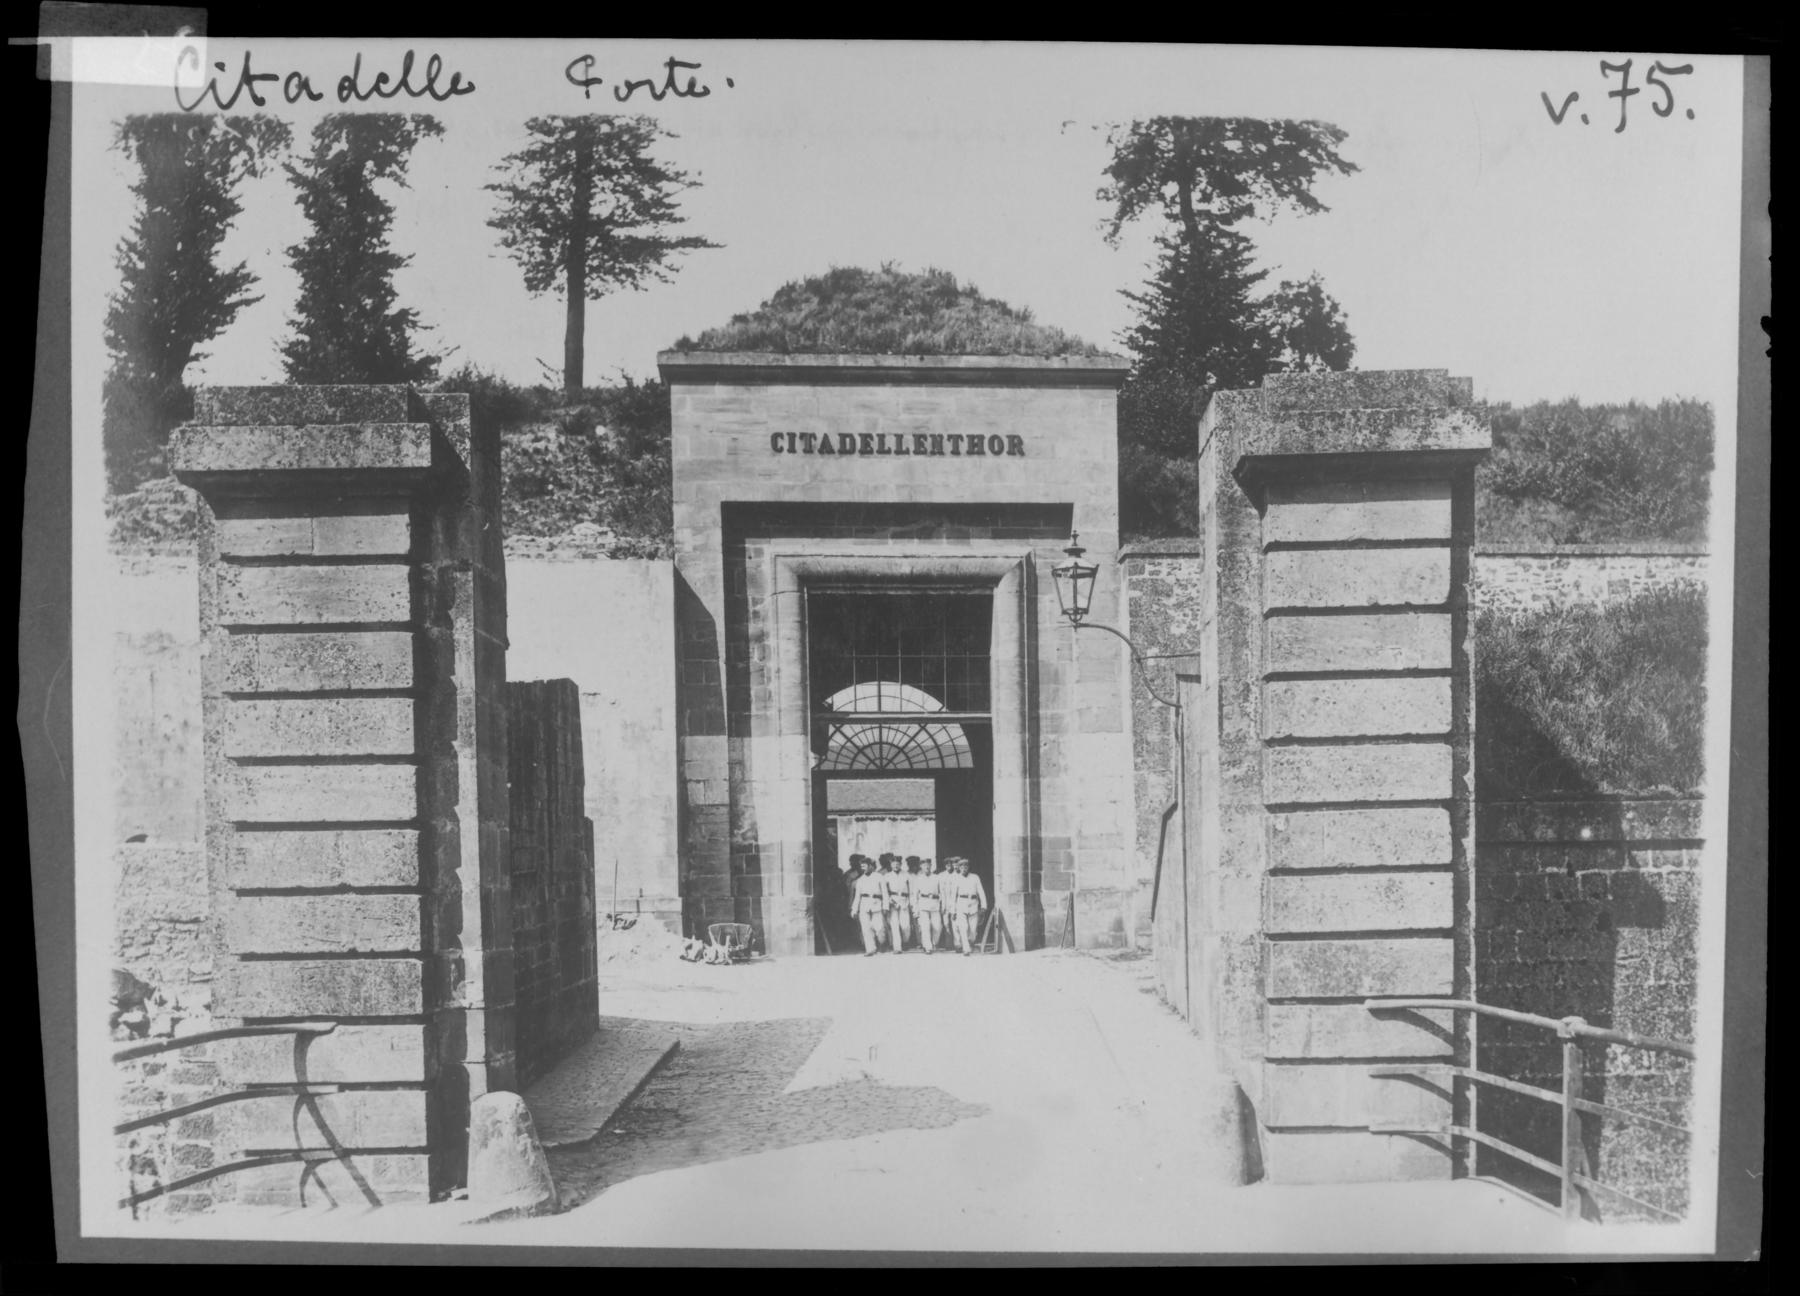 Contenu du La porte de la Citadelle